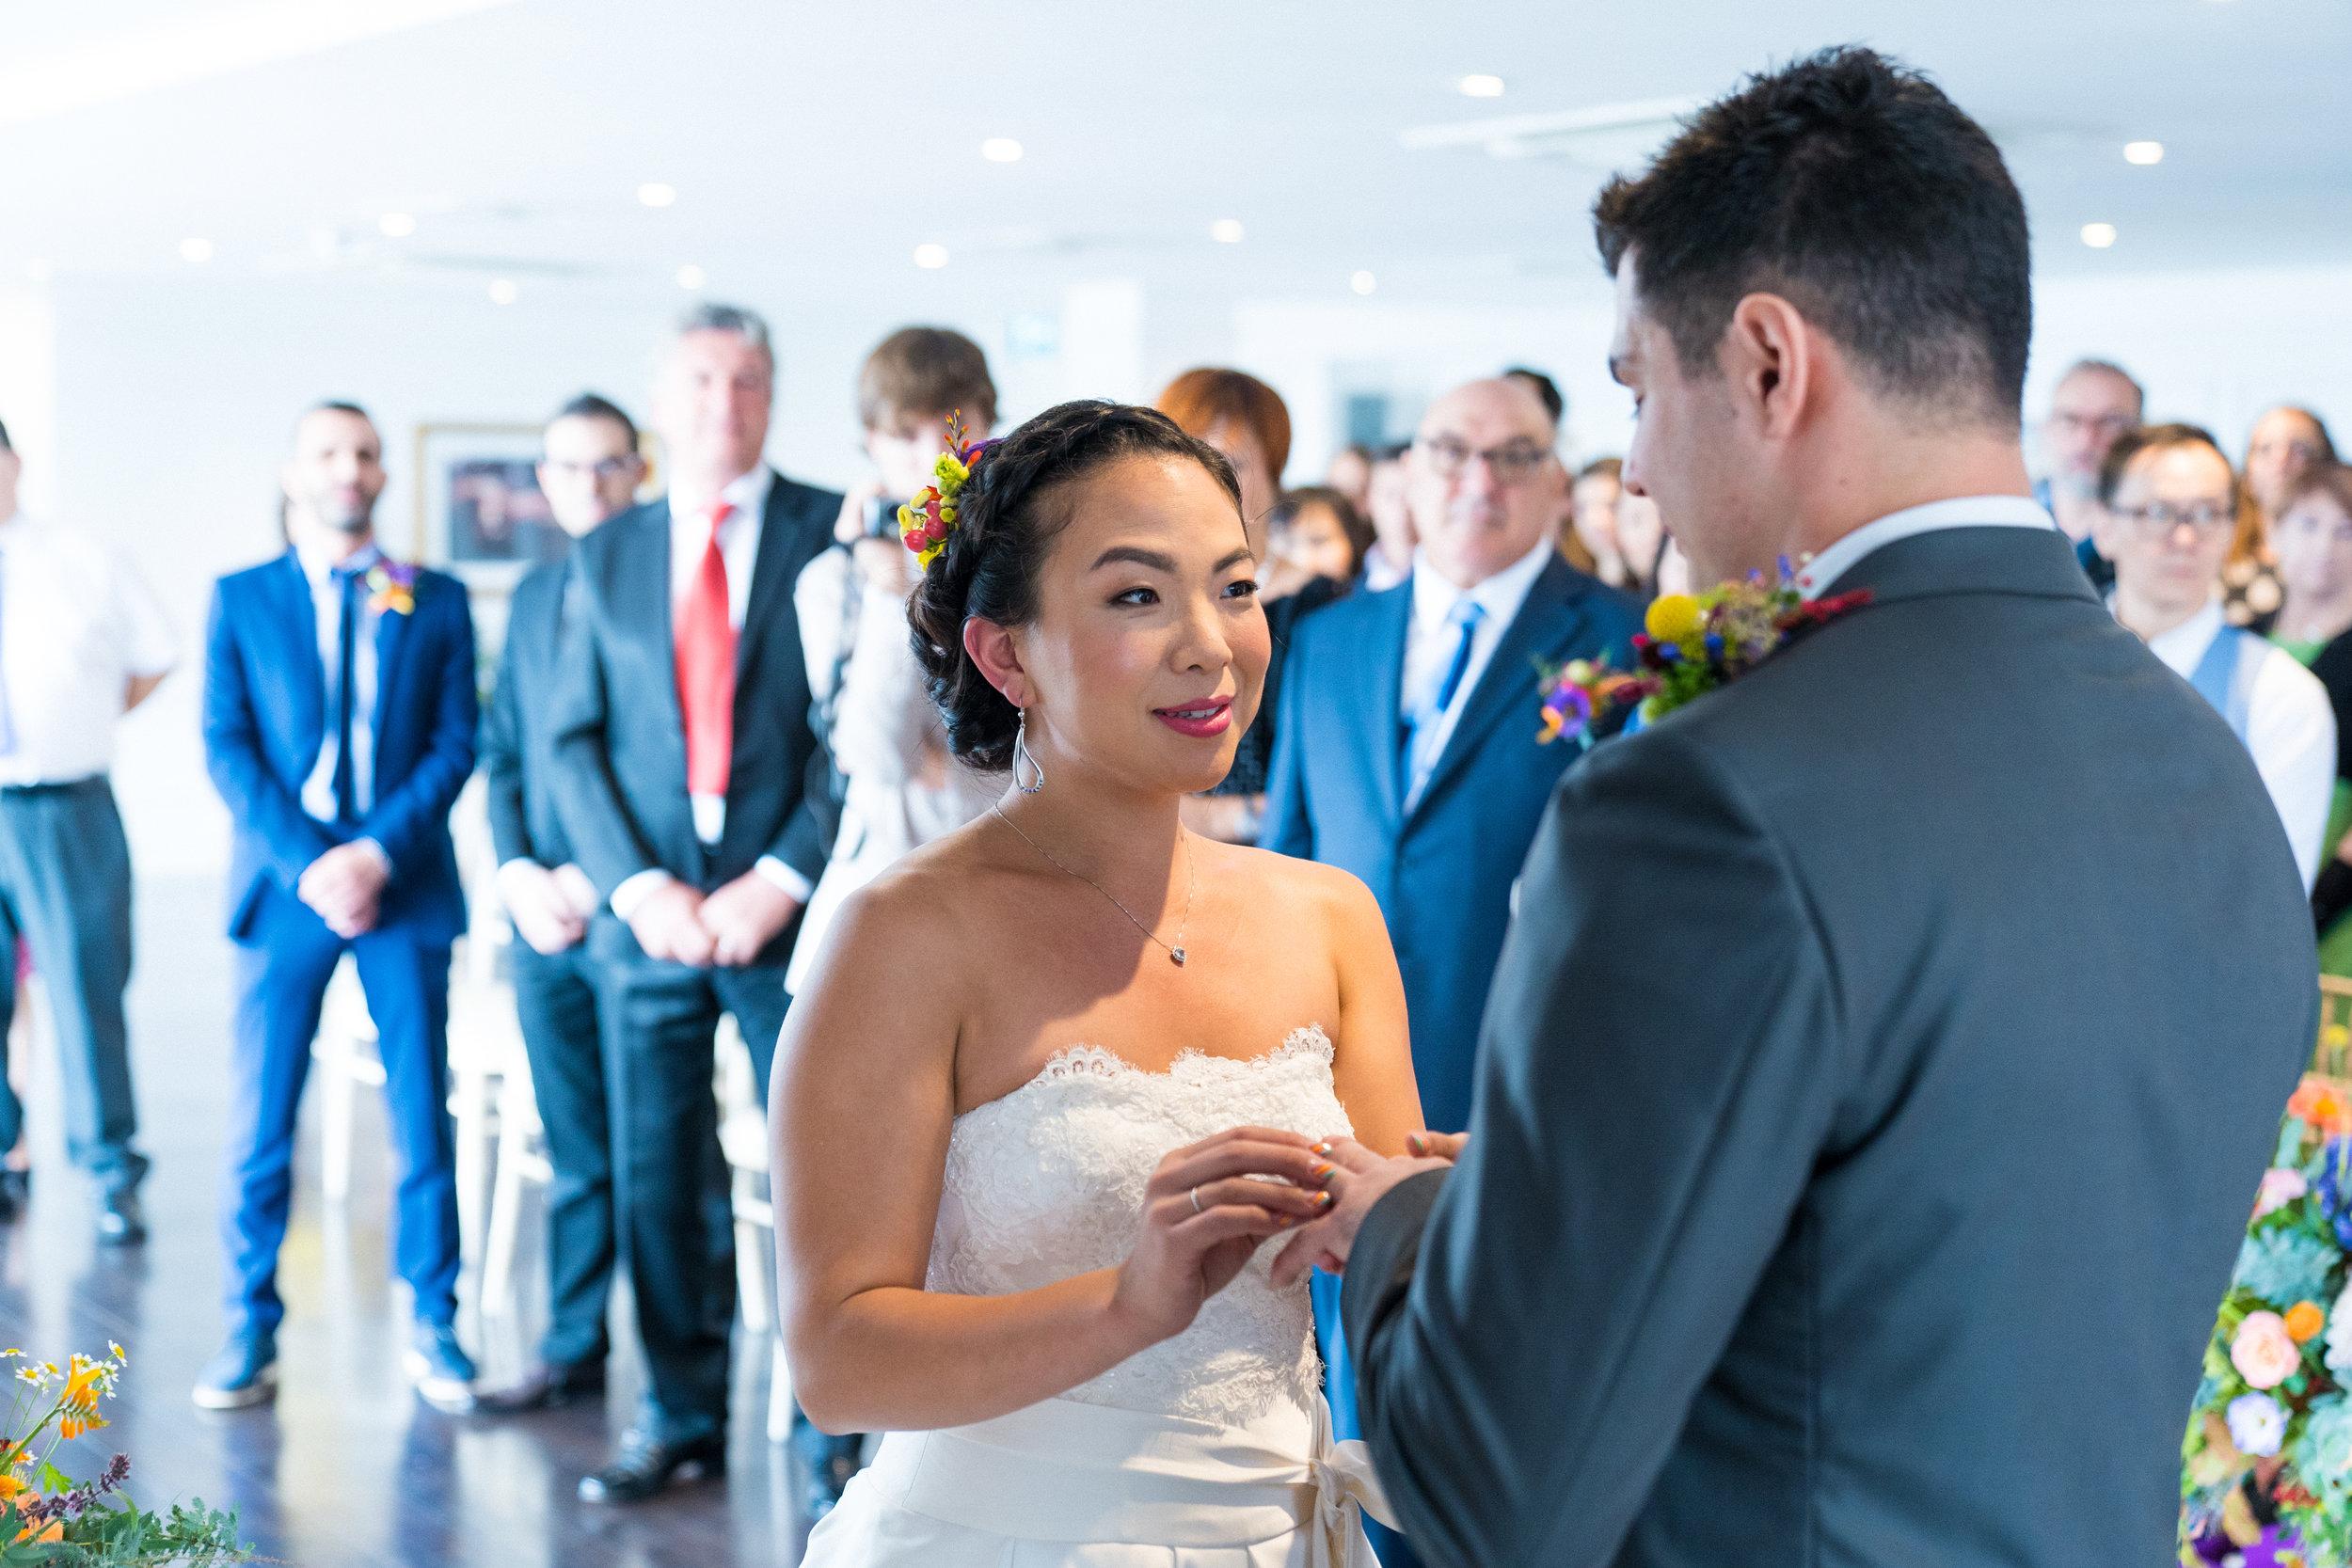 river-rooms-blackfriars-london-stpauls-mondrian-hotel-wedding-photography-videography-38